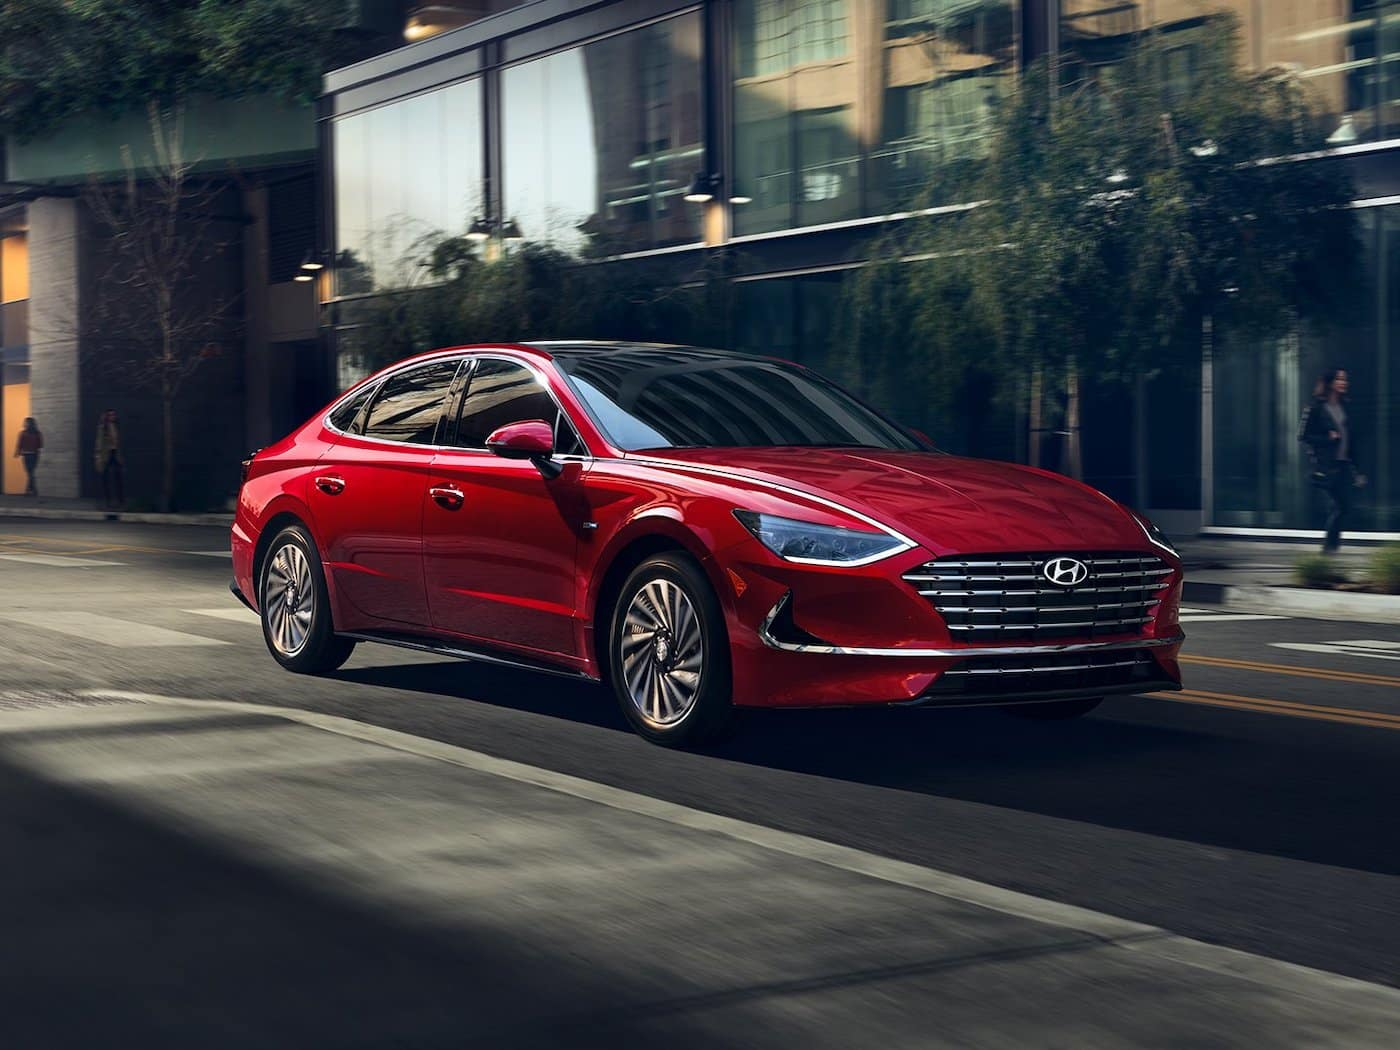 The 2021 Hyundai Sonata Hybrid driving down the street.